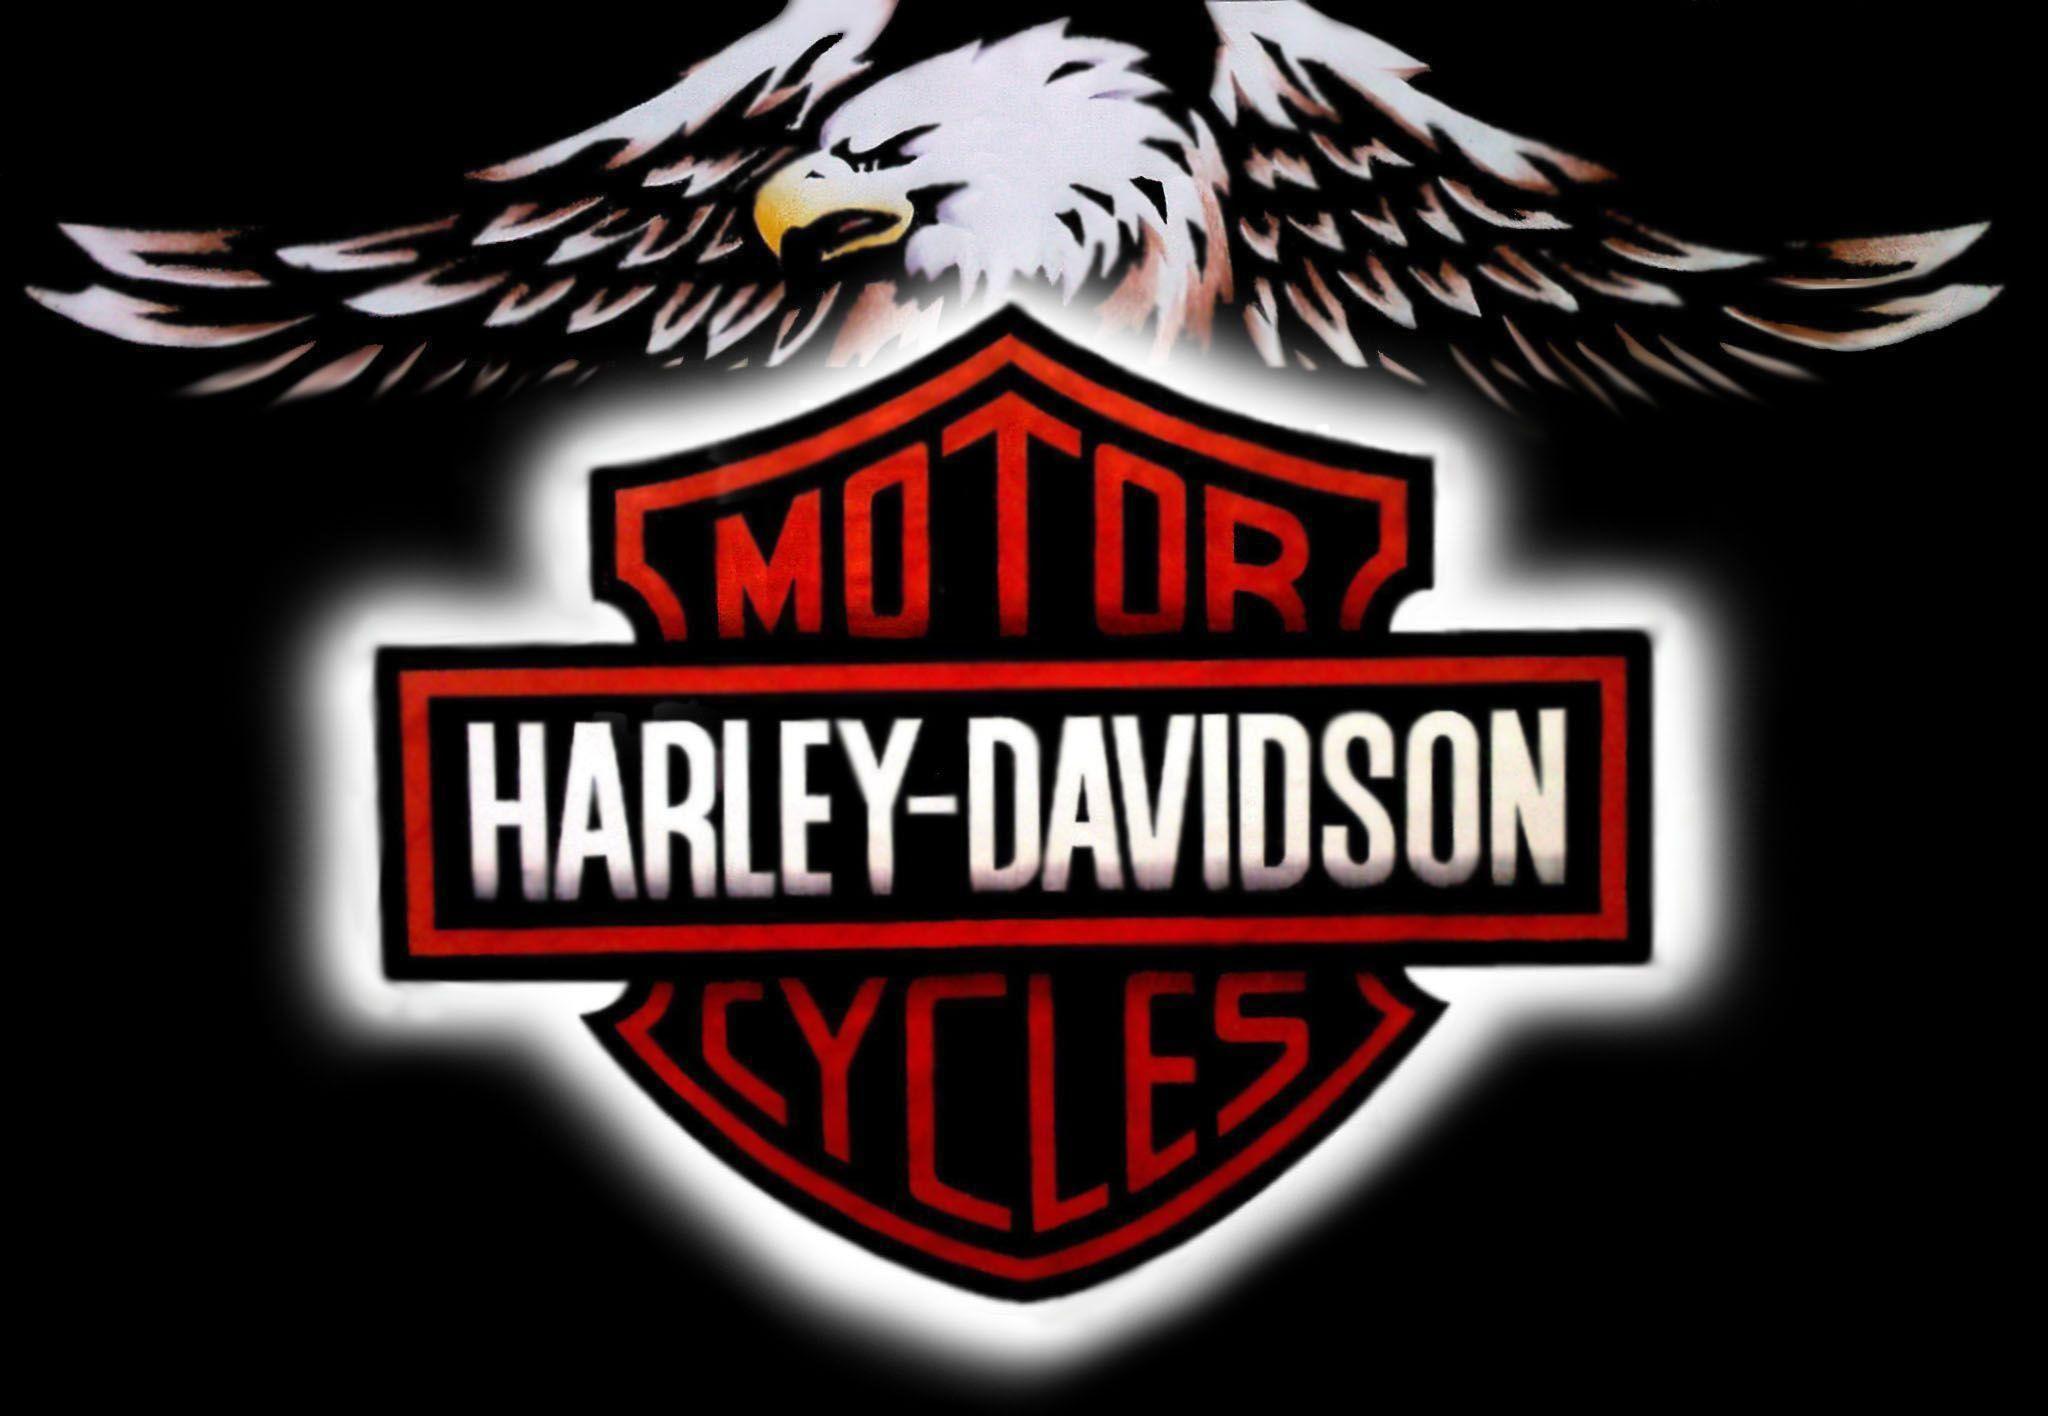 Harley Davidson Skull Logo Wallpaper Images amp Pictures   Becuo 2048x1416